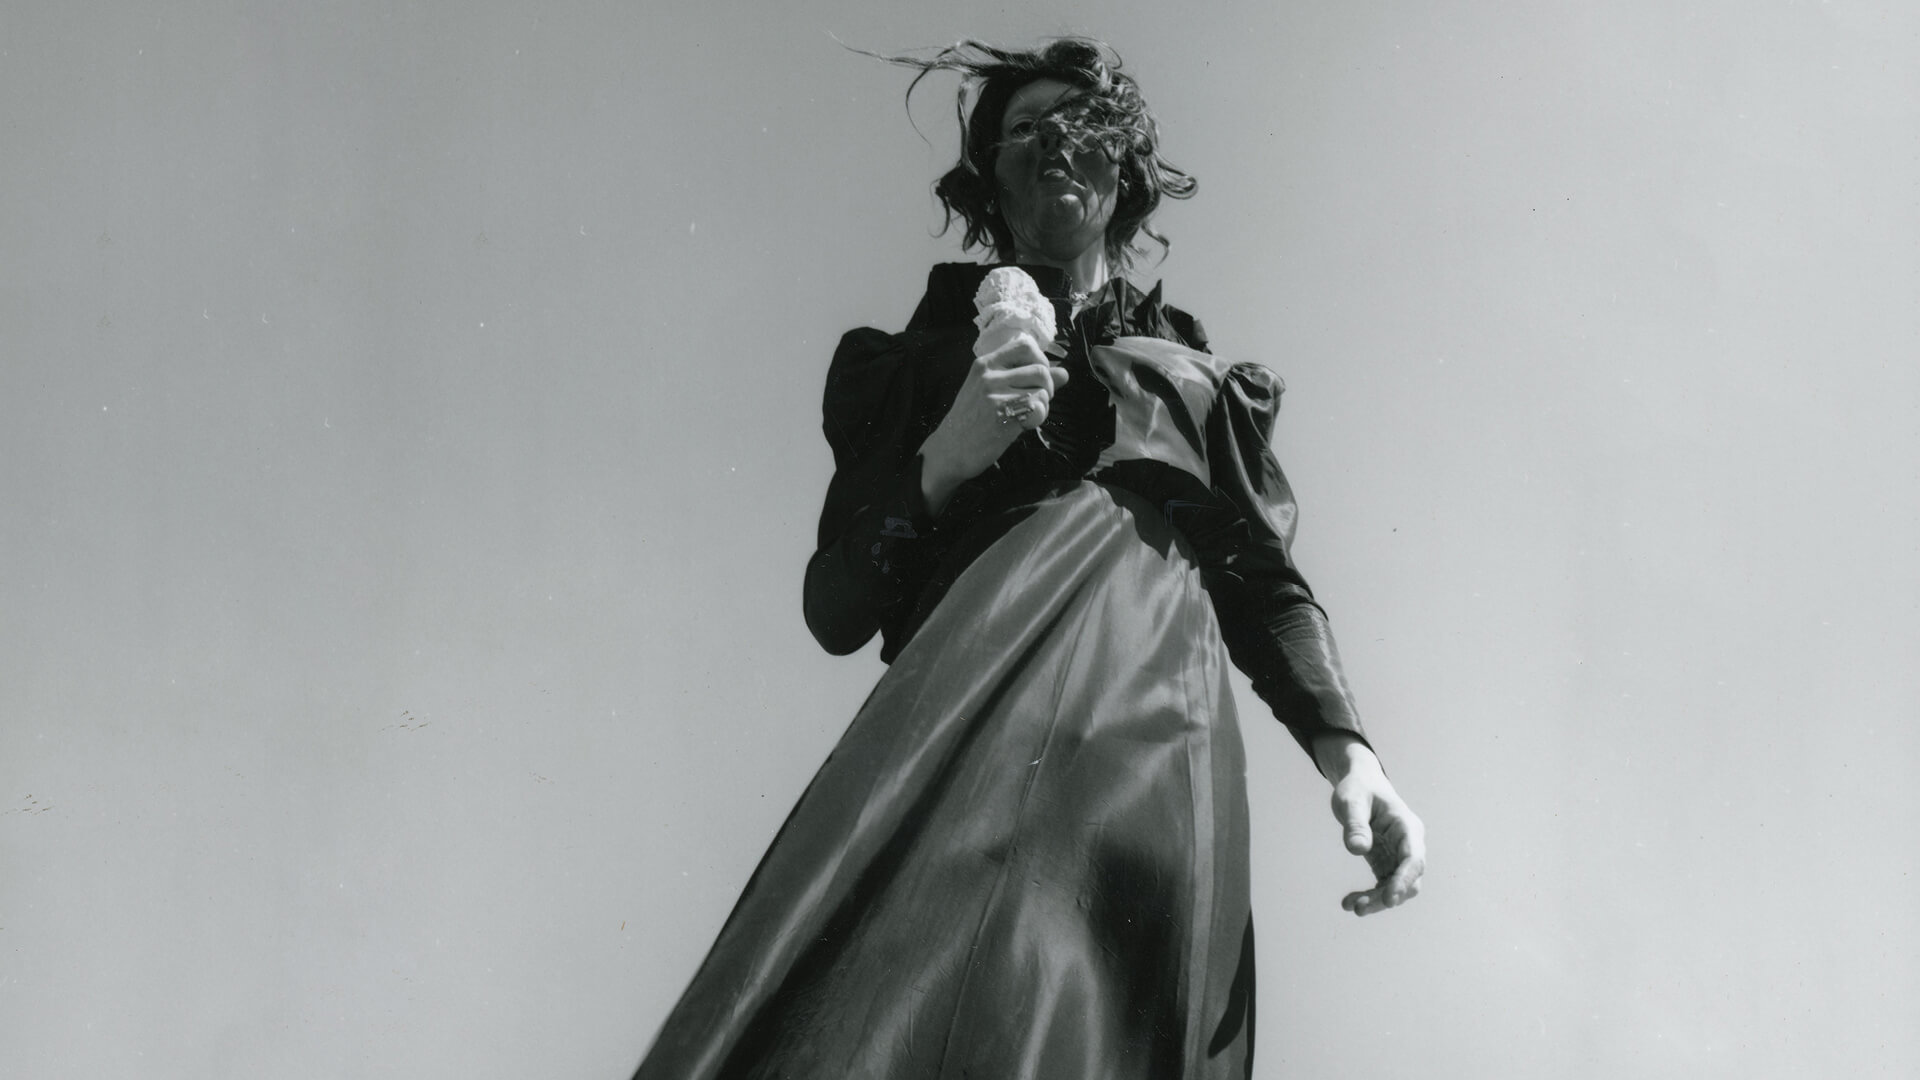 A still from Green (1988) by Luther Price, as Tom Rhoads   Green   Tom Rhoads   STIRworld